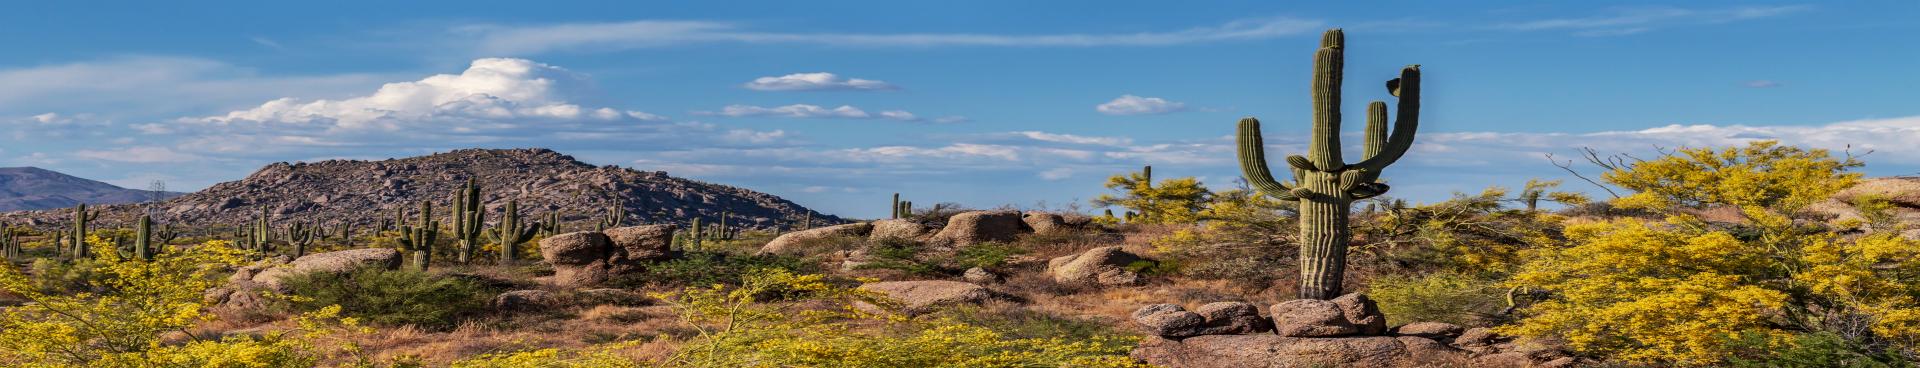 Arizona panorama resized